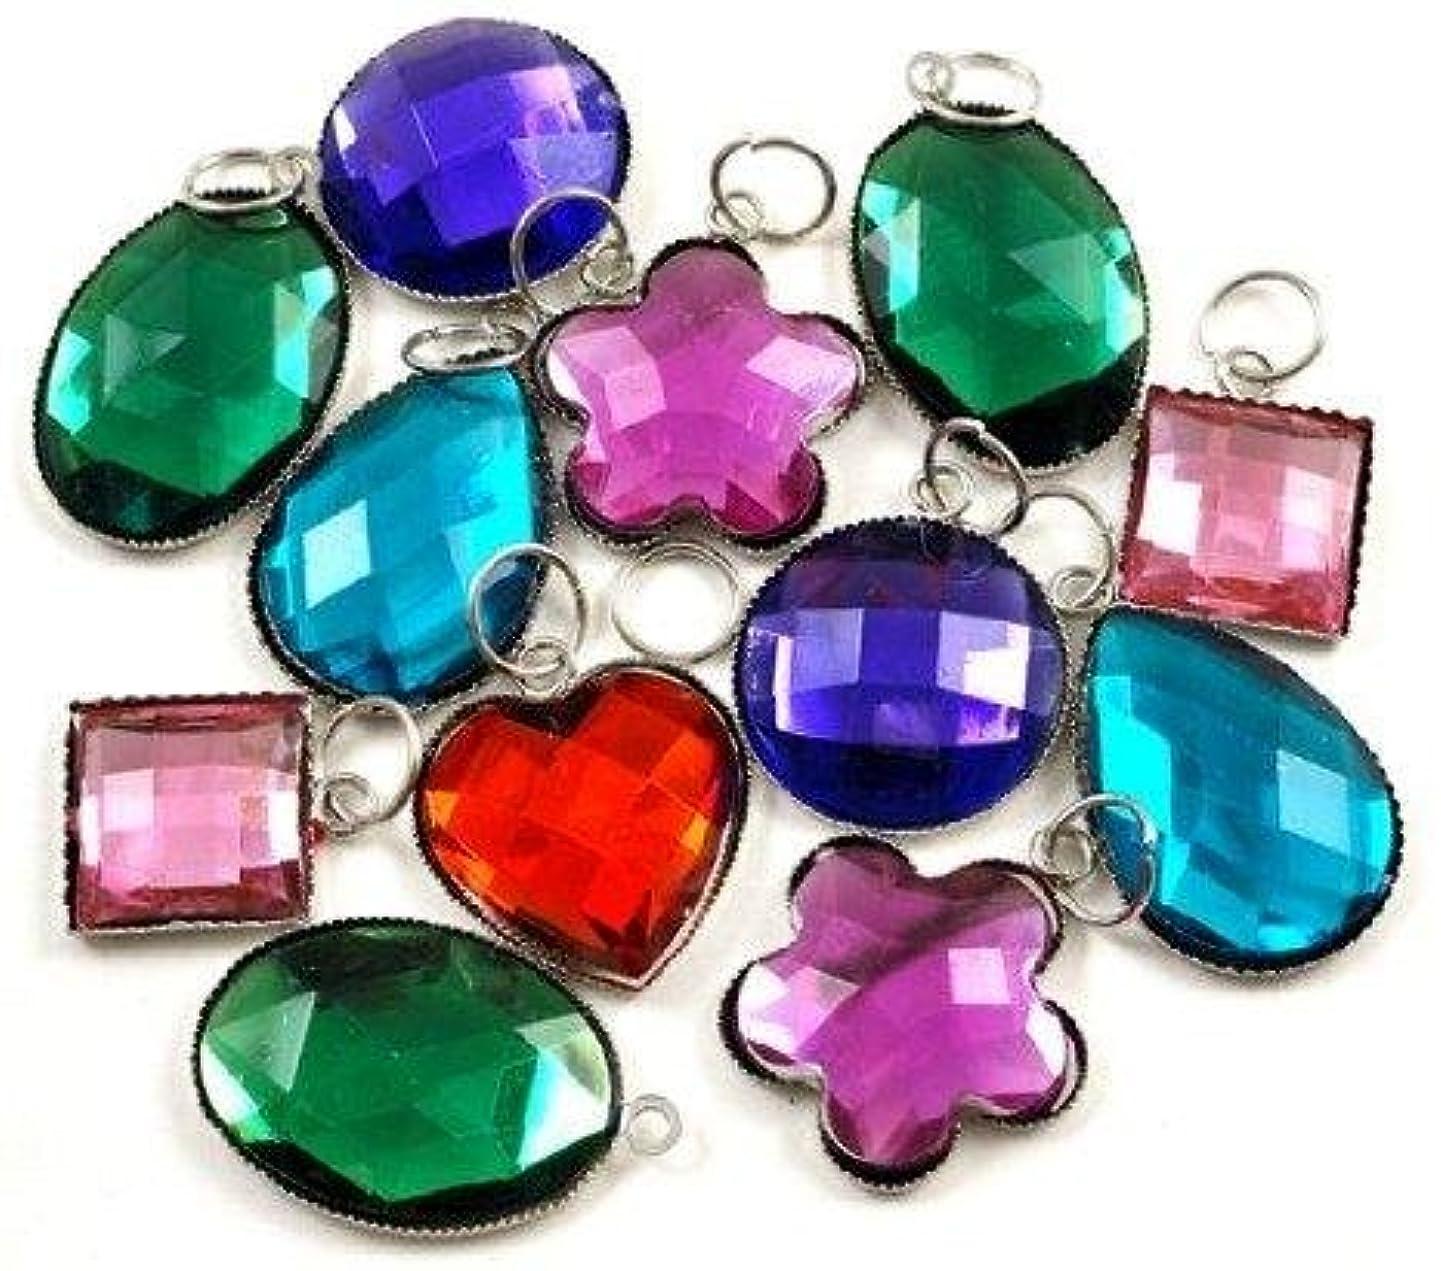 Large Gemstone Charms For Rubberband Bracelets (Set Of 12)